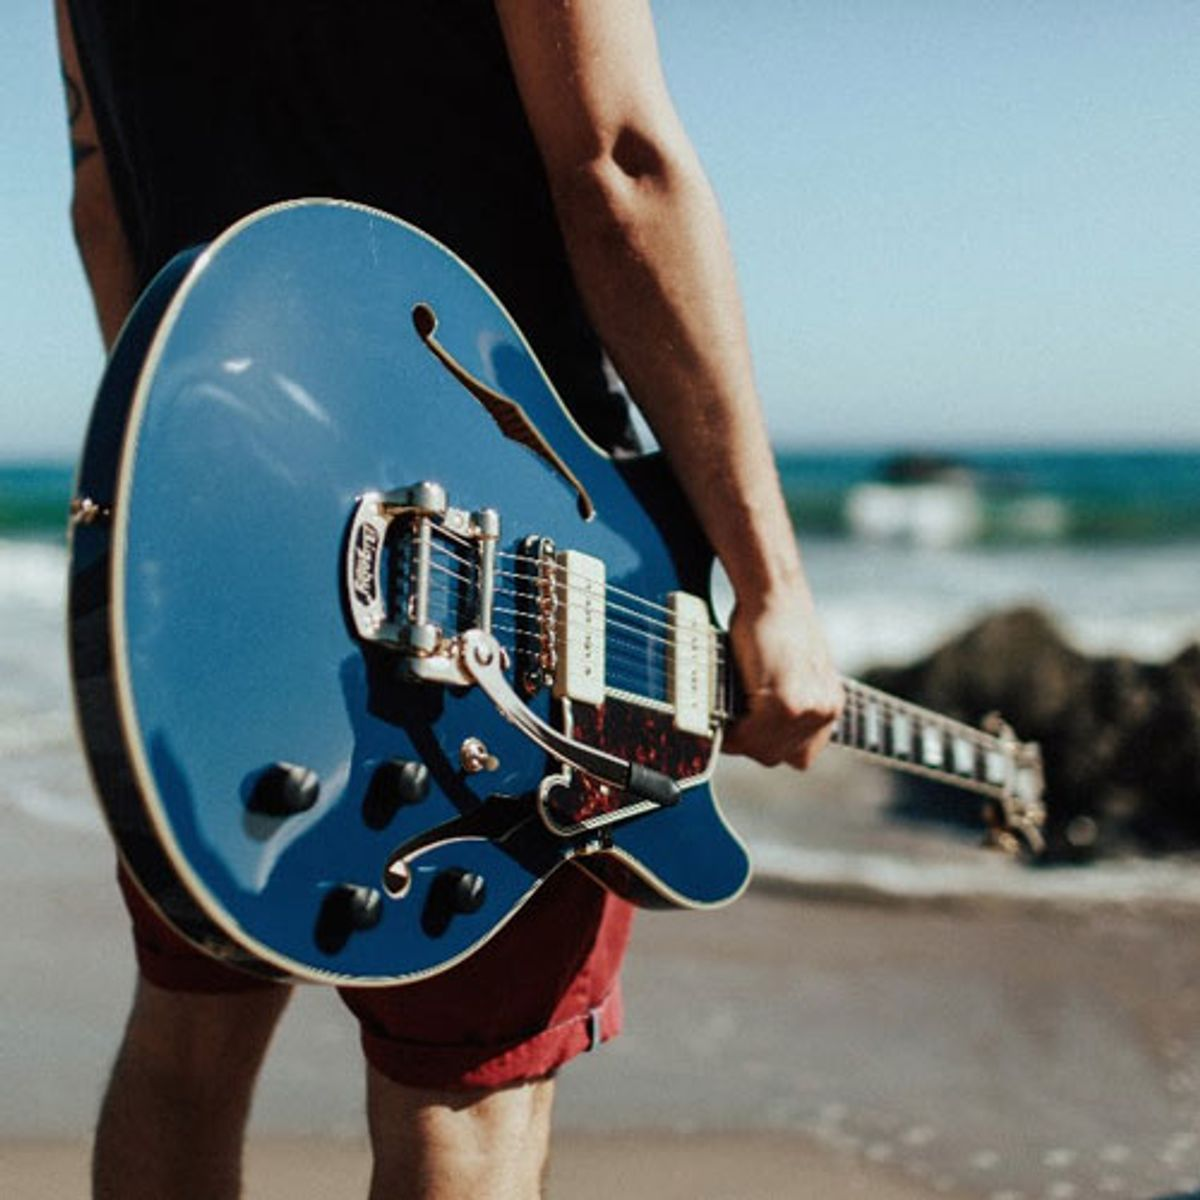 D'Angelico Guitars Debuts the Excel Shoreline